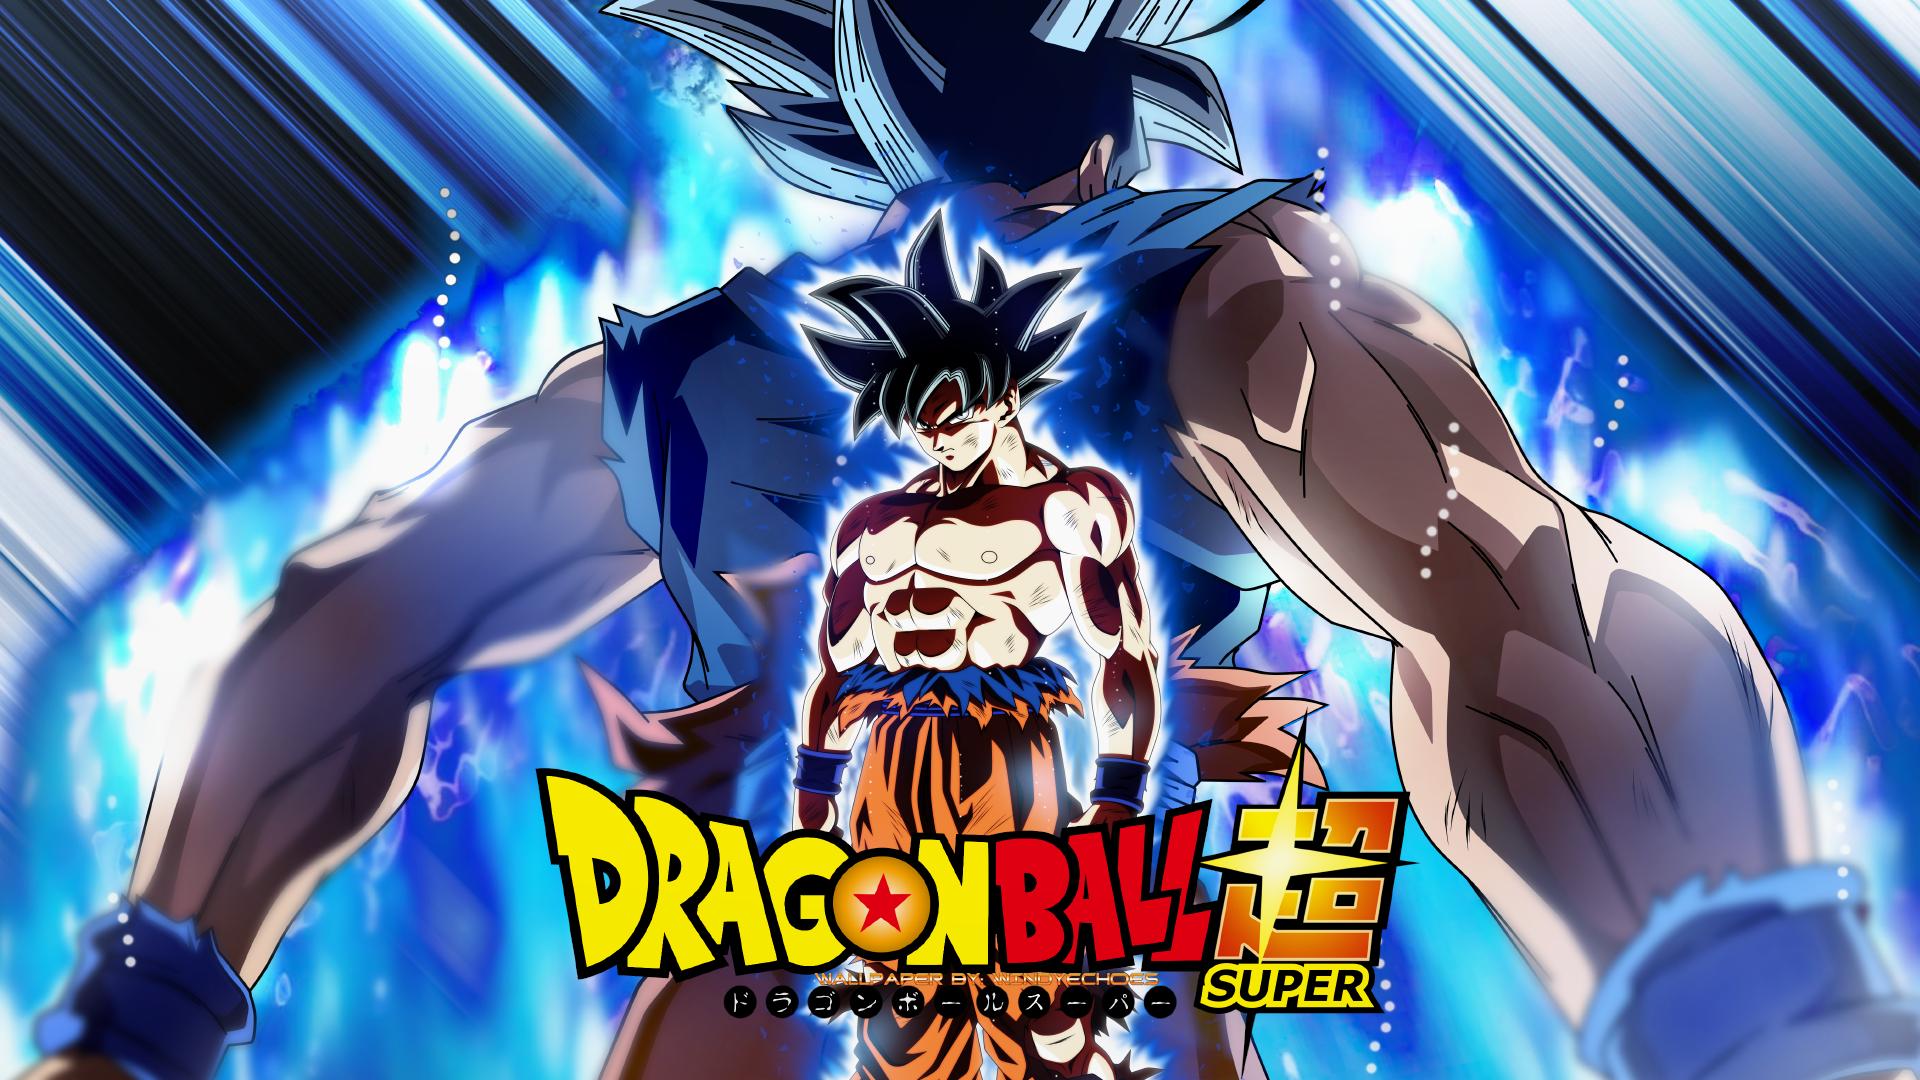 Dragon Ball Super Wallpaper Ultra Instinct: Ultra Instinct Wallpaper 101 DBS By WindyEchoes On DeviantArt